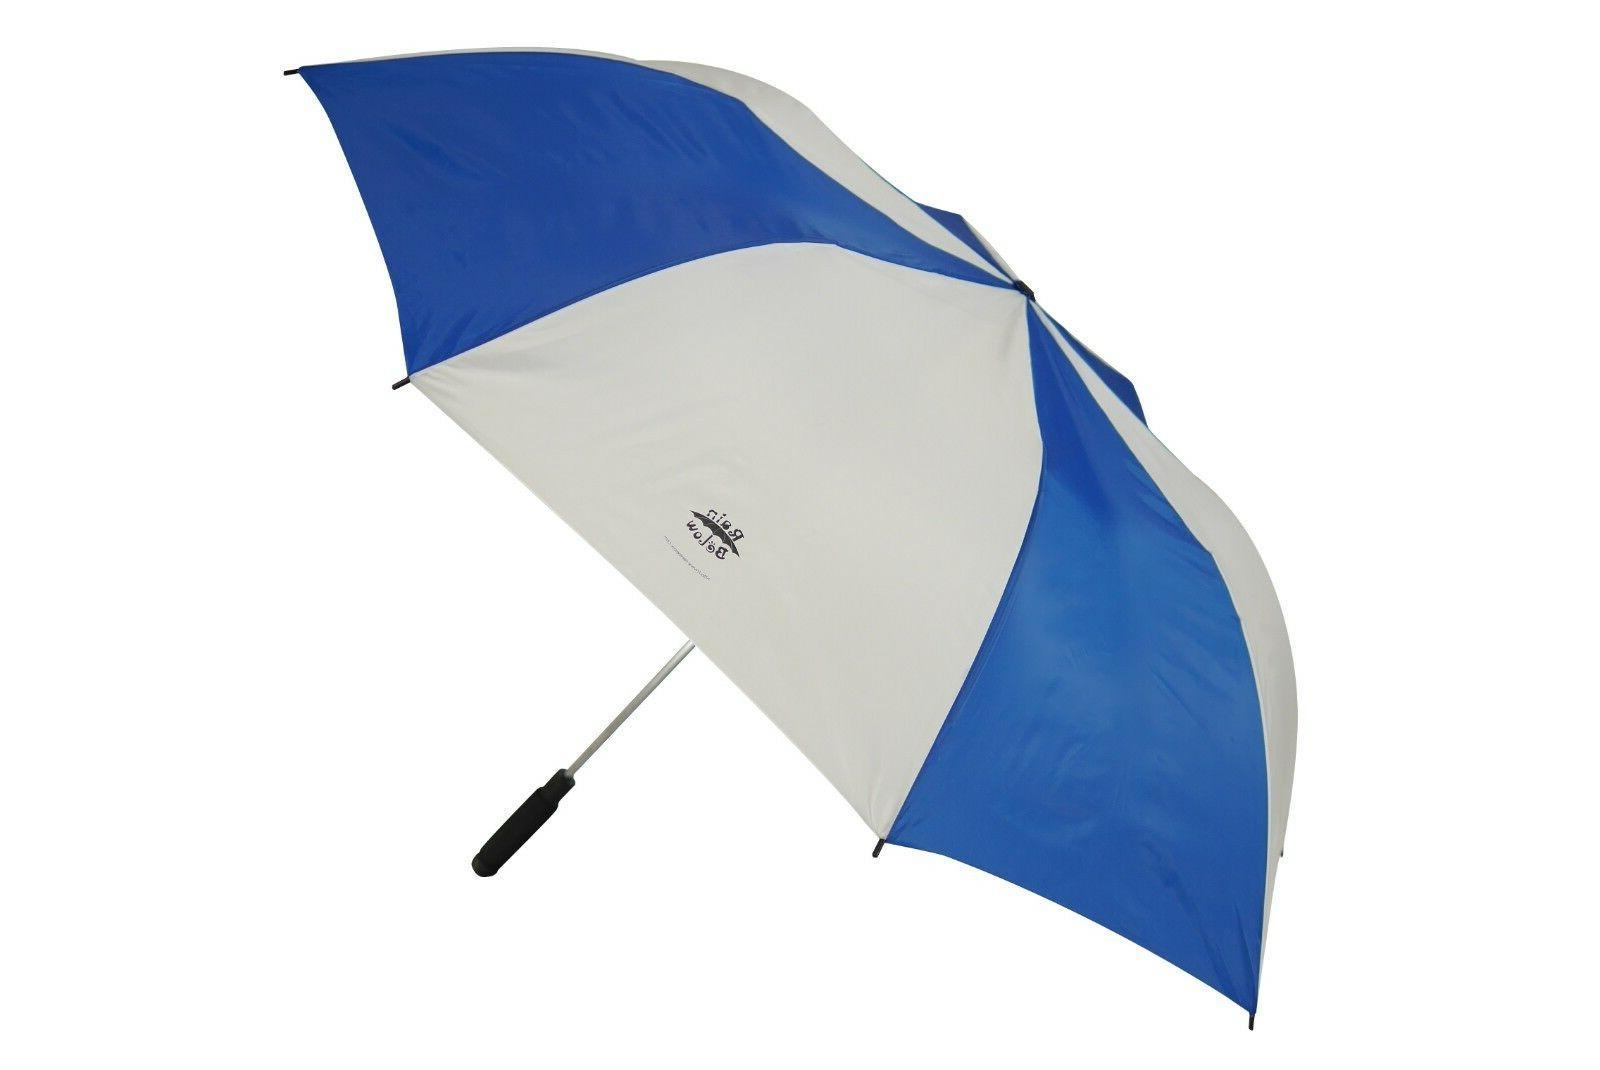 kud 58 inch arc canopy folding golf